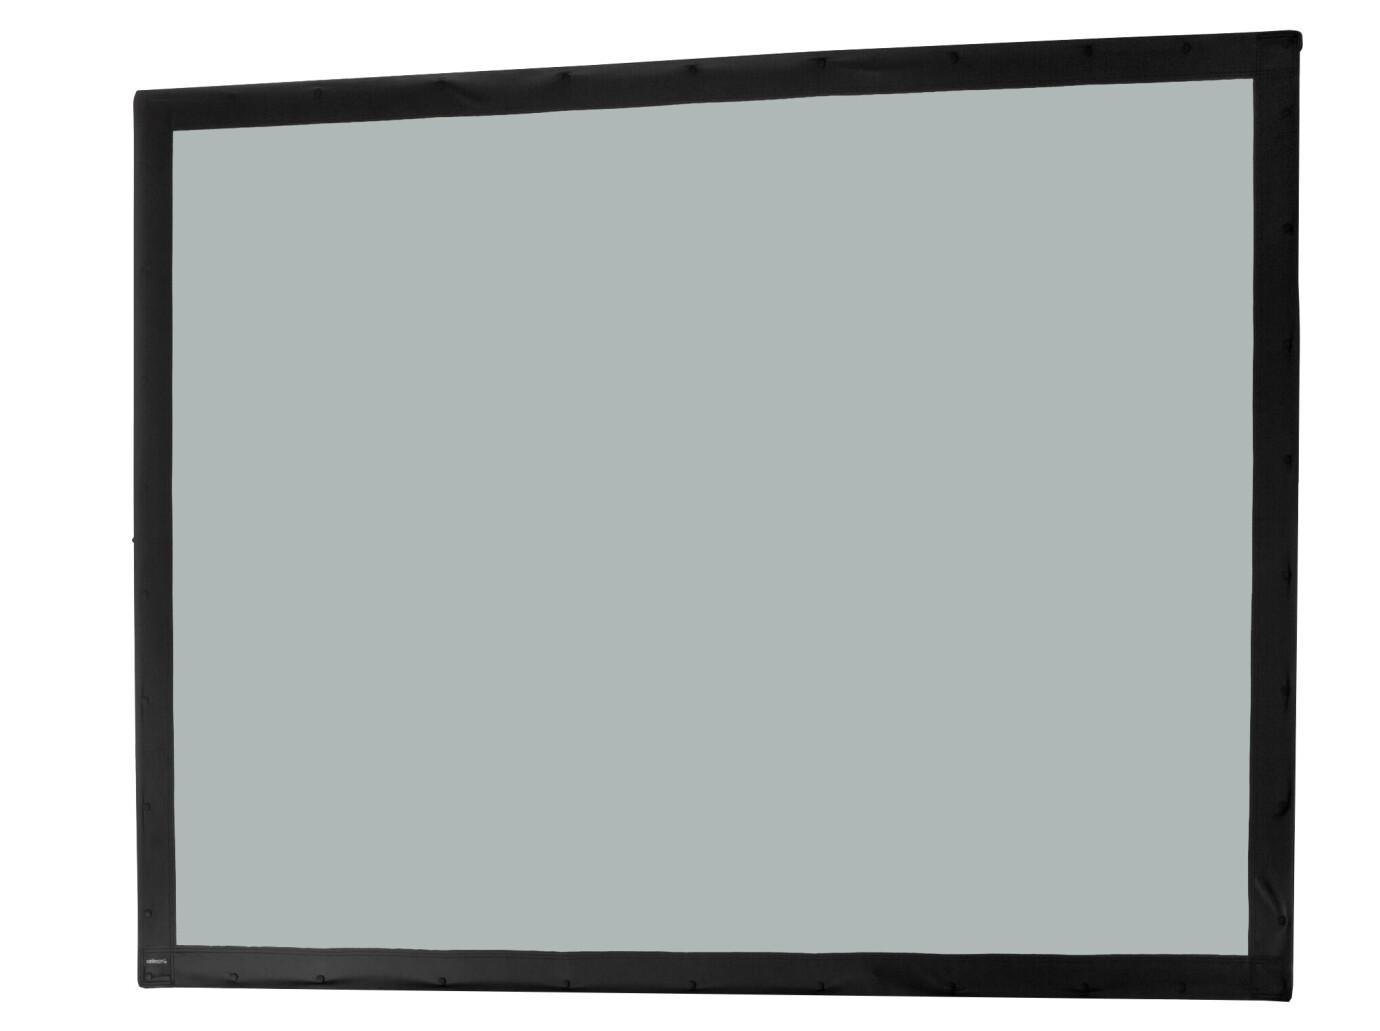 celexon Tuch für Faltrahmen Mobil Expert - 203 x 152 cm Rückprojektion